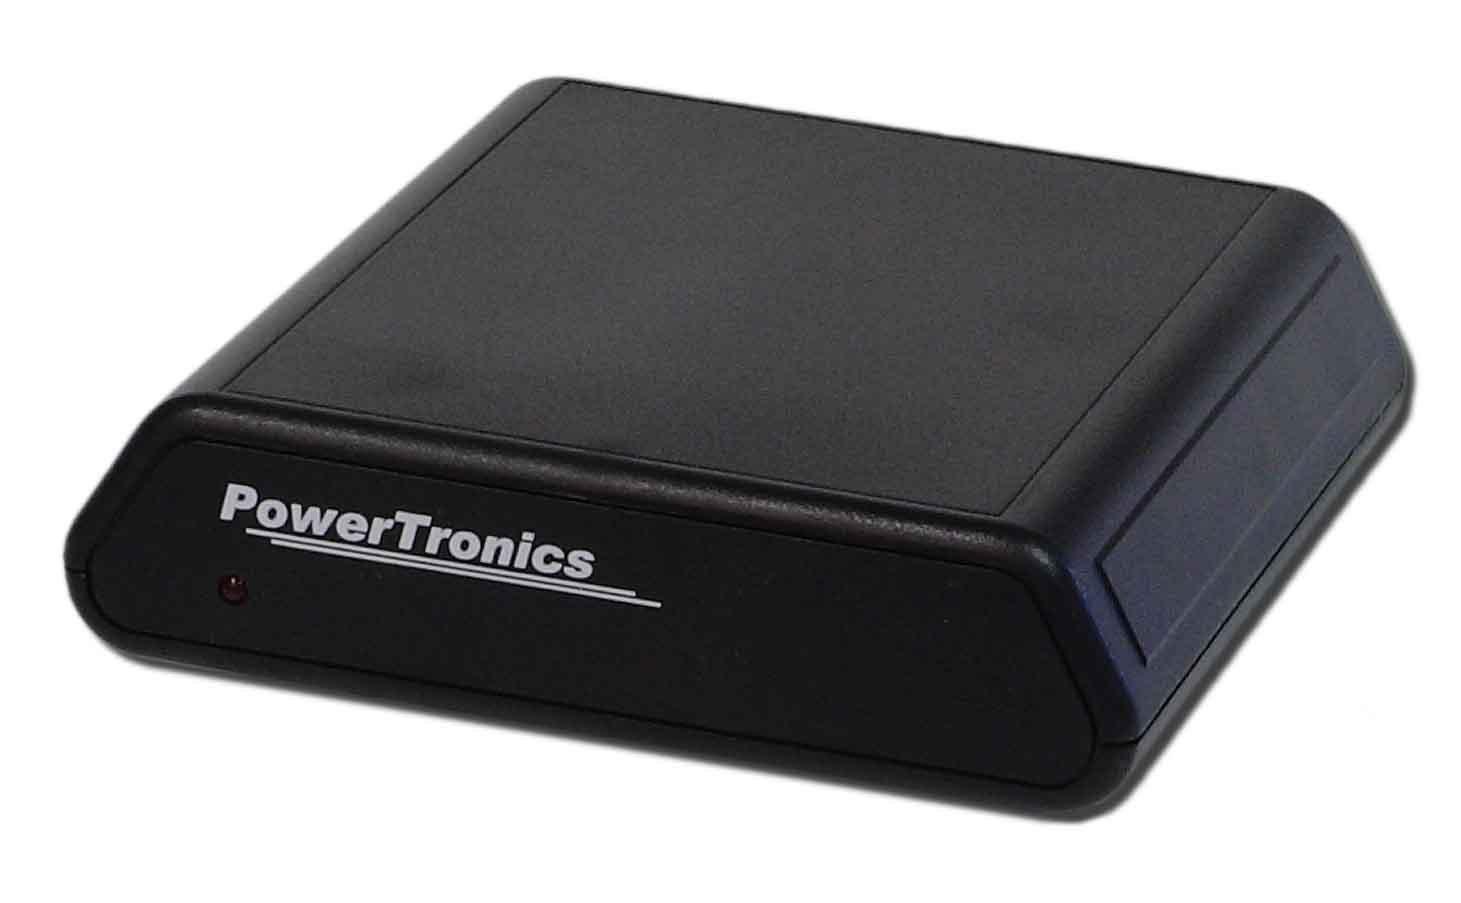 Powertronics PQR D50 Voltage Disturbance Recorder, Black